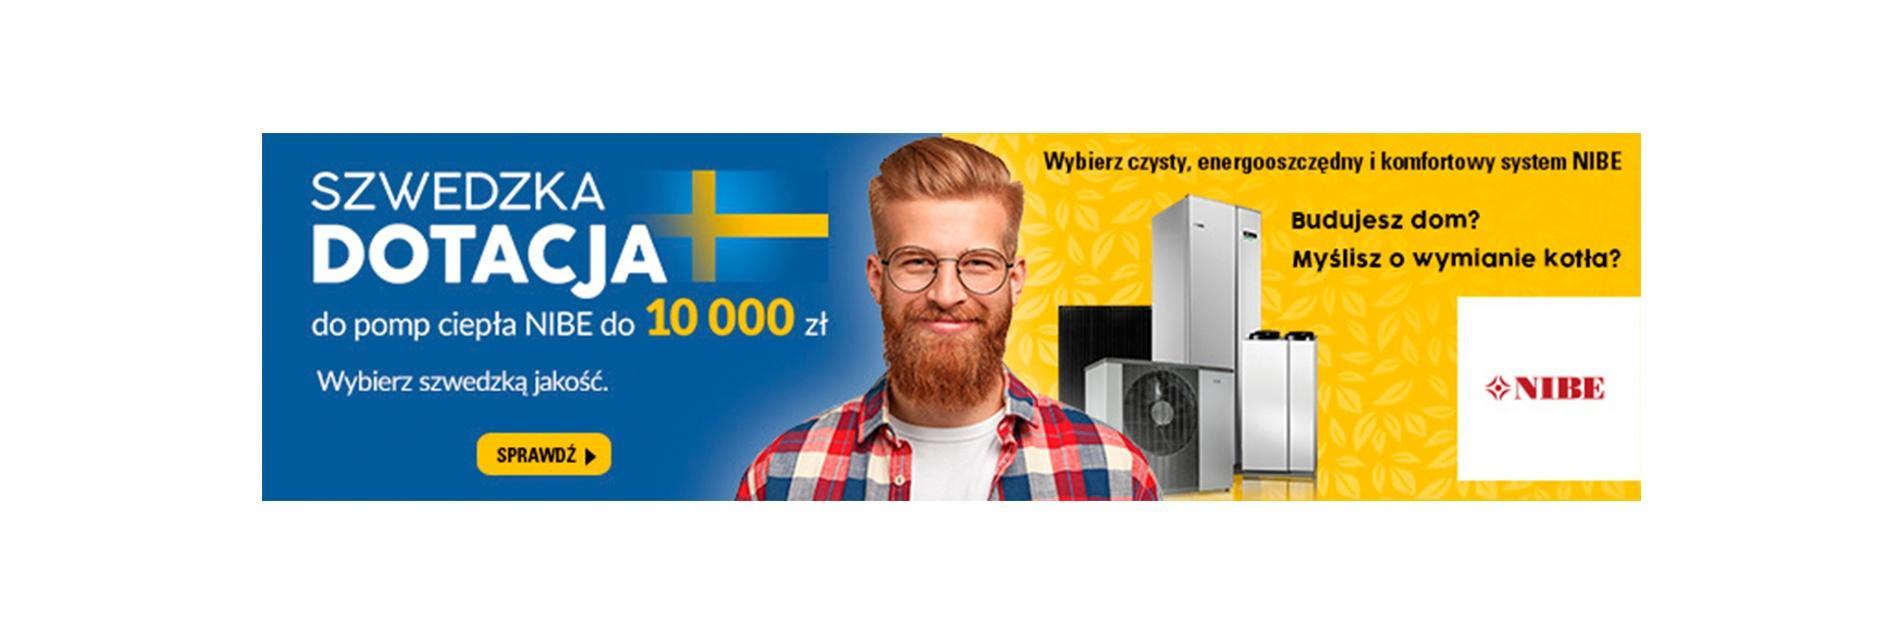 http://derkon.com.pl/wp-content/uploads/2019/02/derkon_szwedzka2019-2.jpg